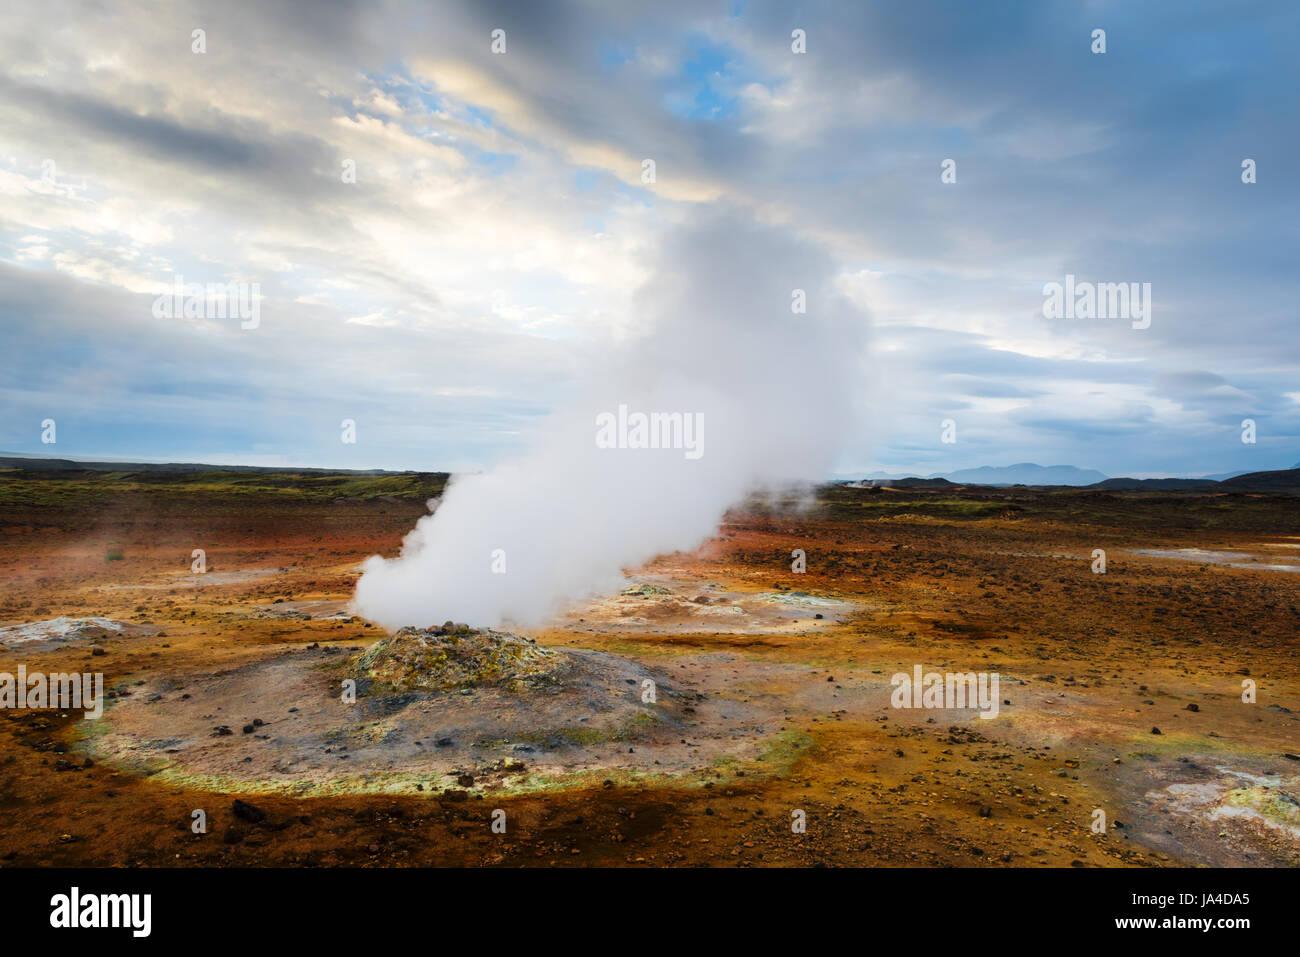 Smoking fumaroles on Hverarond valley, north Iceland, Europe. - Stock Image